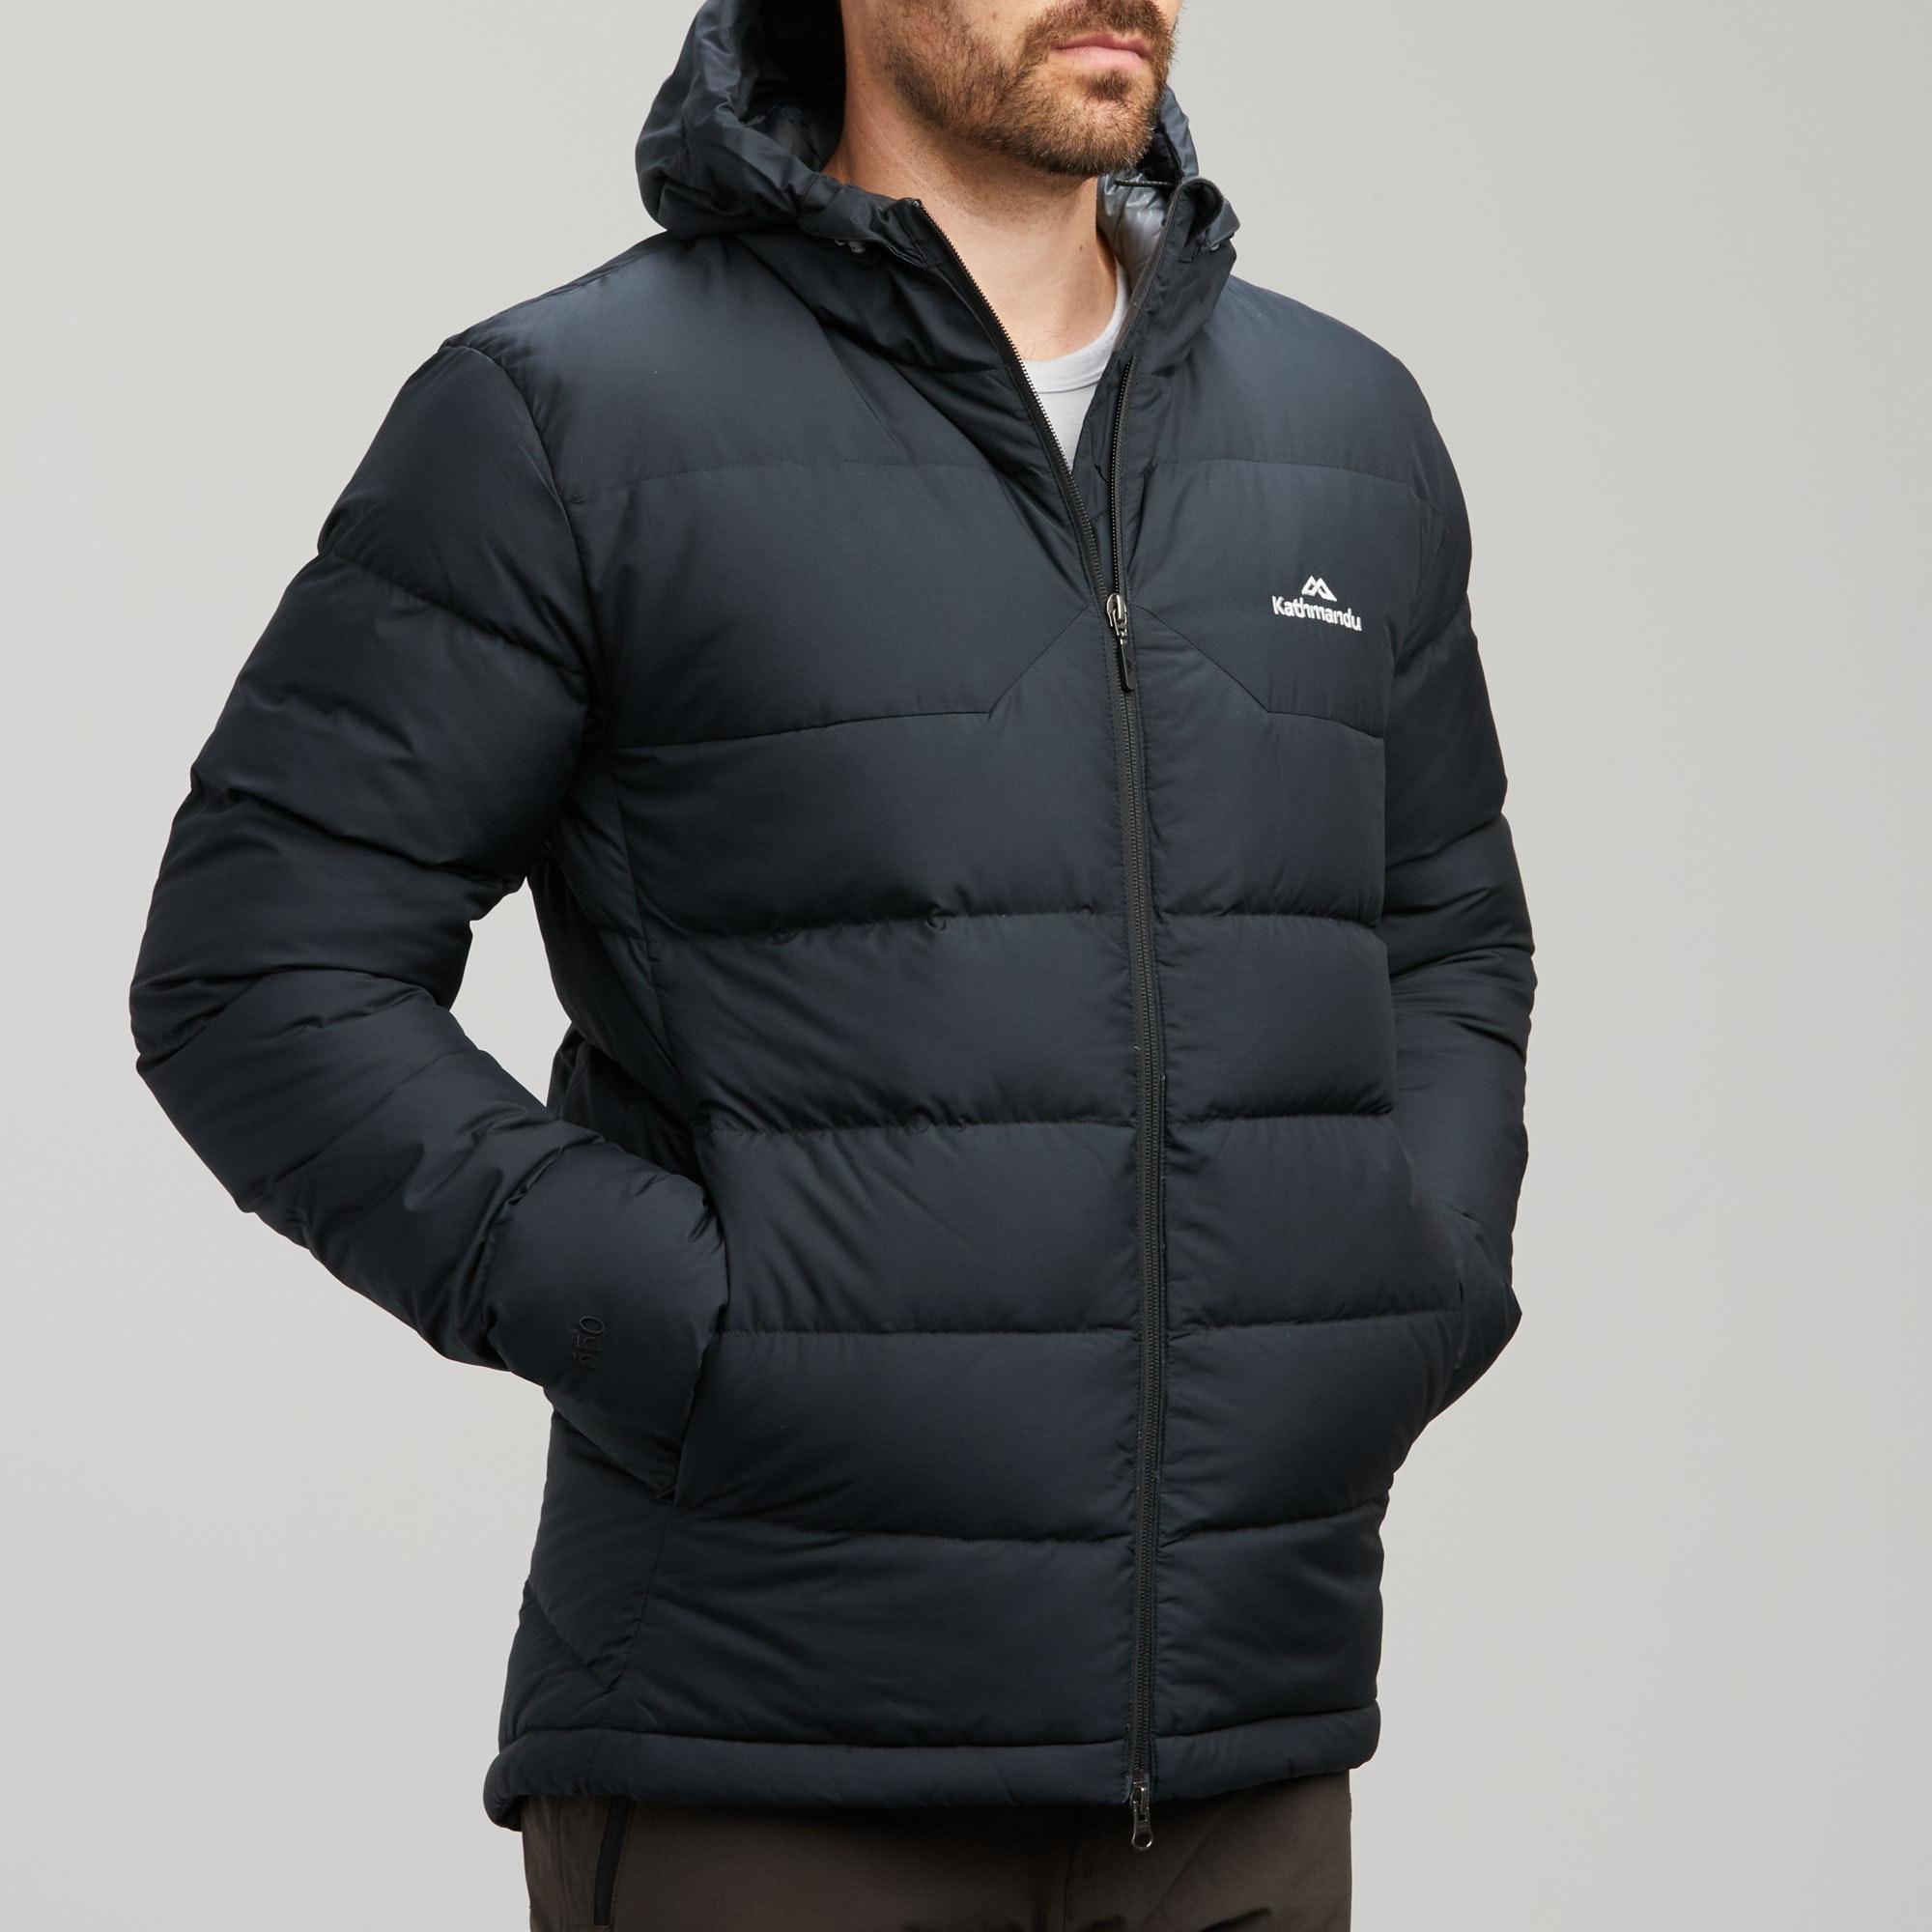 NEW-Kathmandu-Epiq-Men-039-s-Hooded-Warm-Winter-Duck-Down-Puffer-Jacket-v2 thumbnail 11